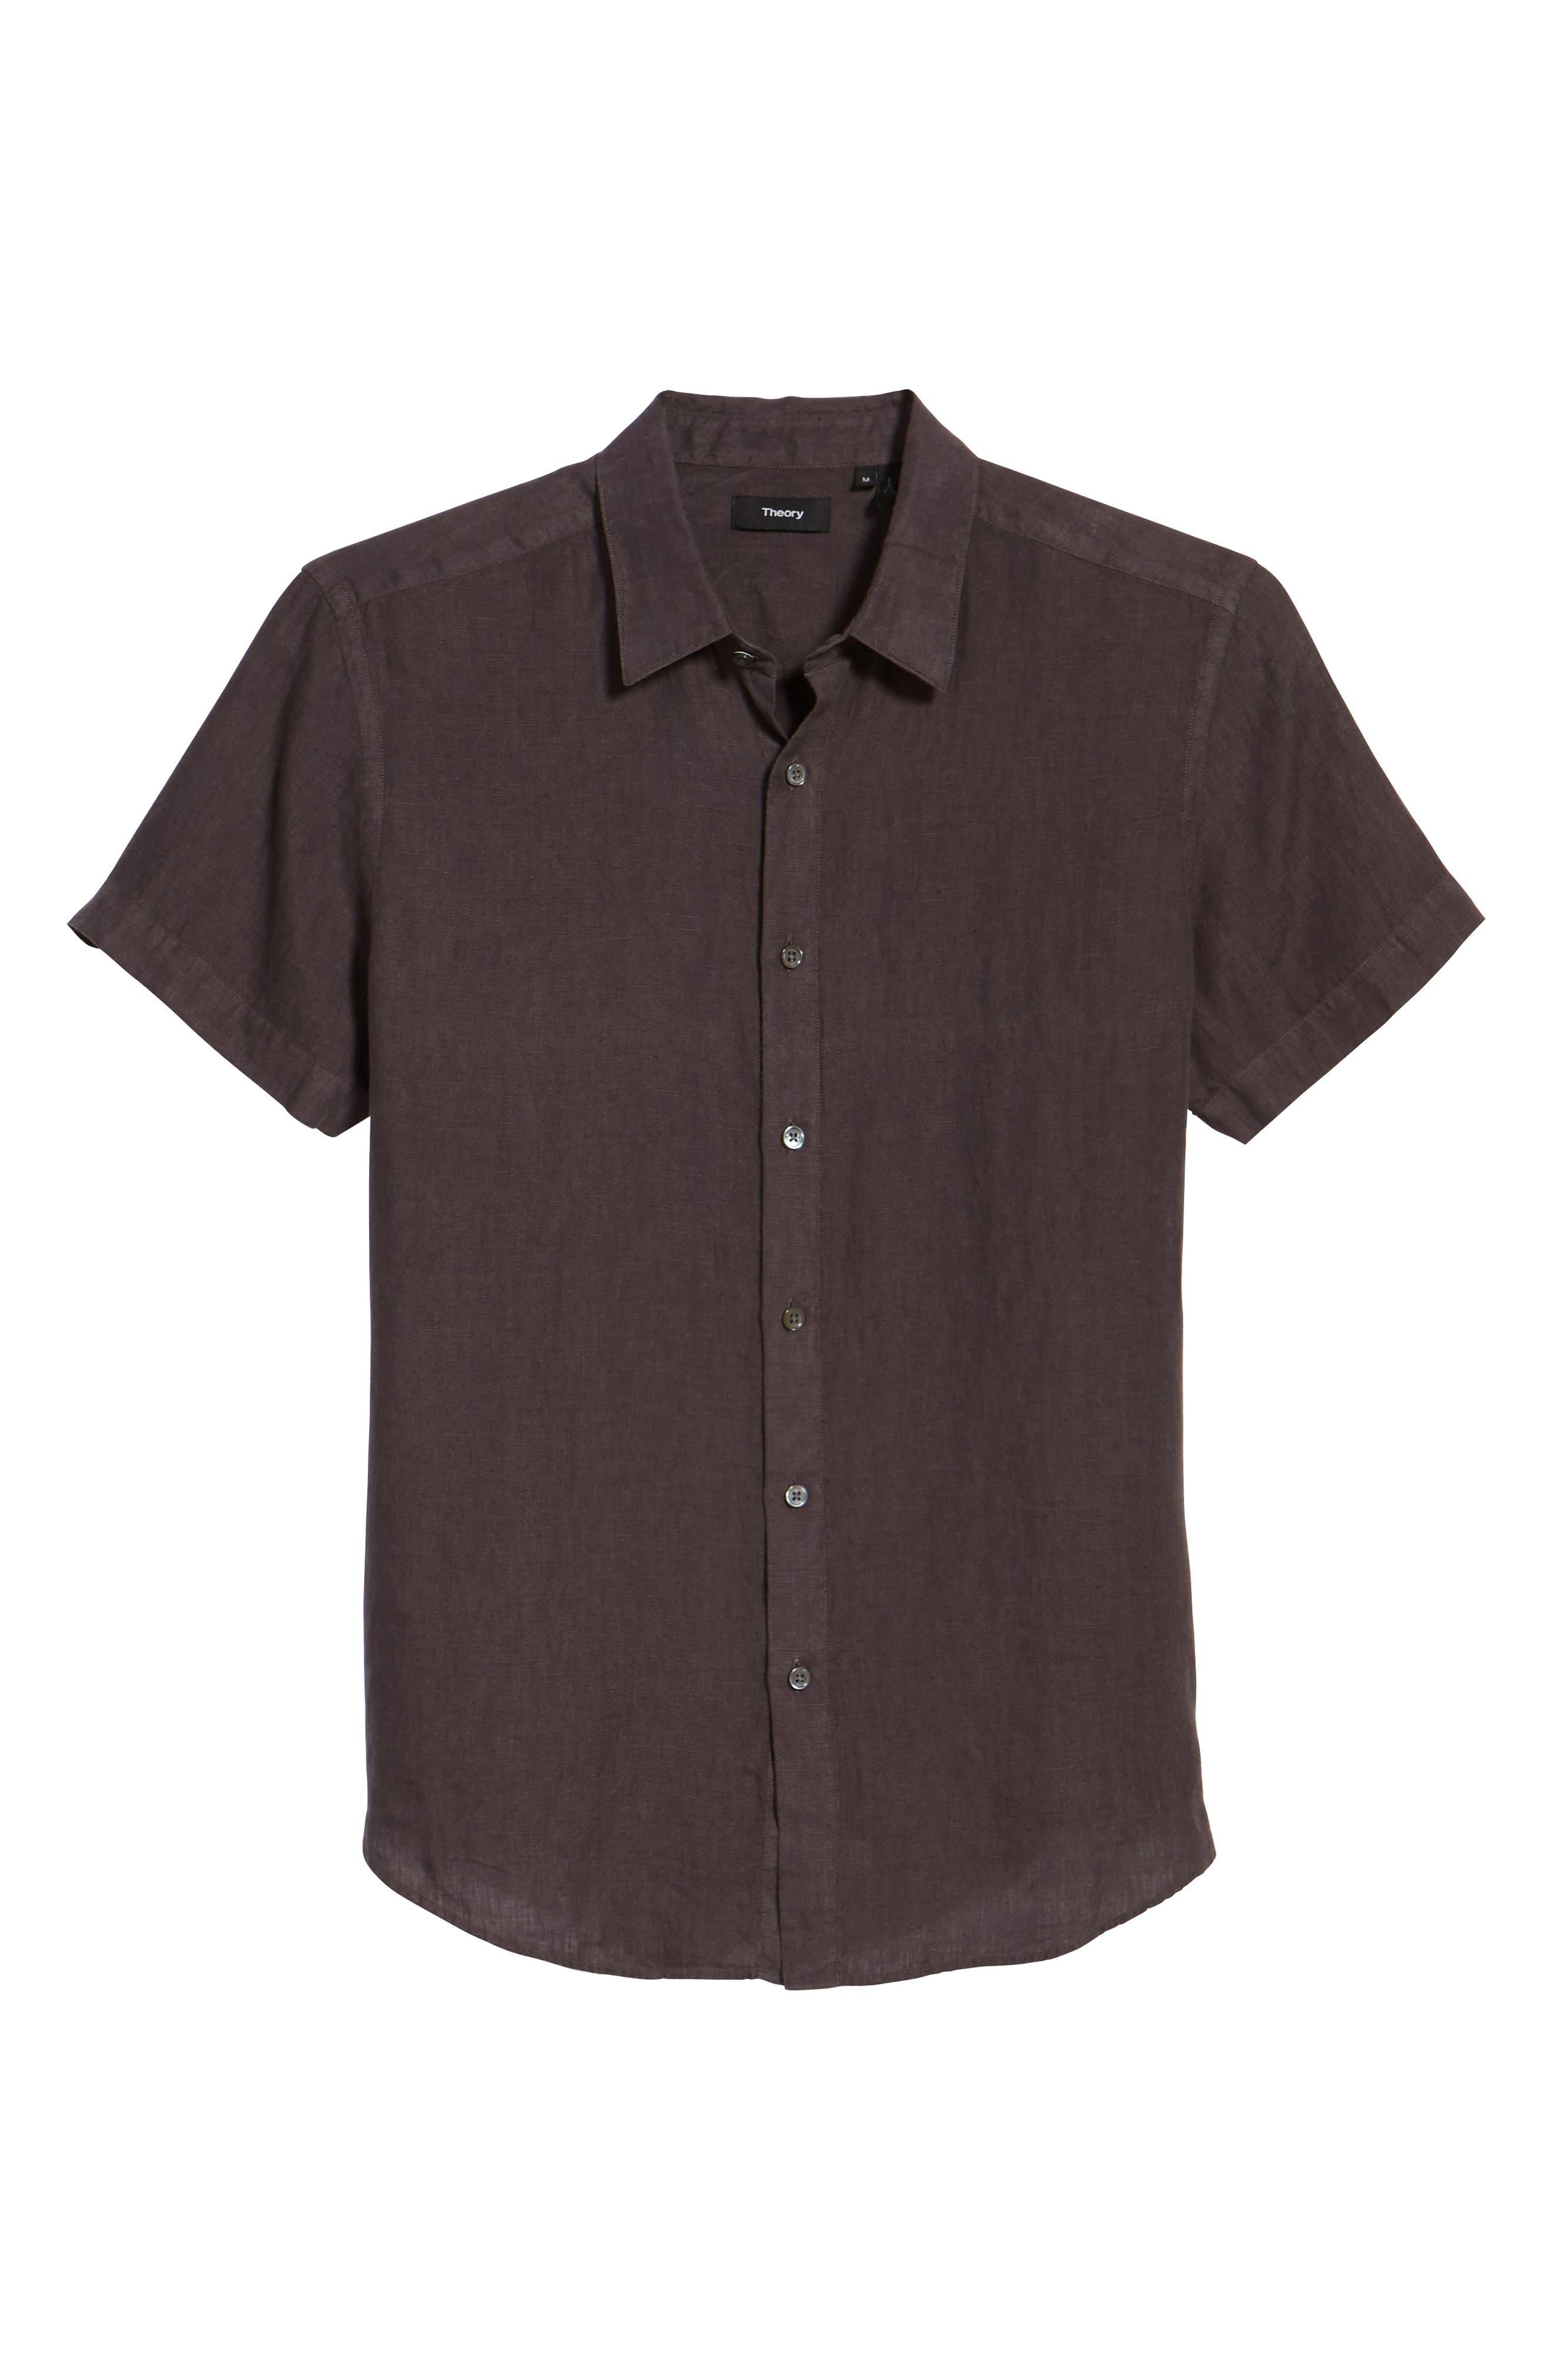 Main Image - Theory Clark Trim Fit Linen Sport Shirt